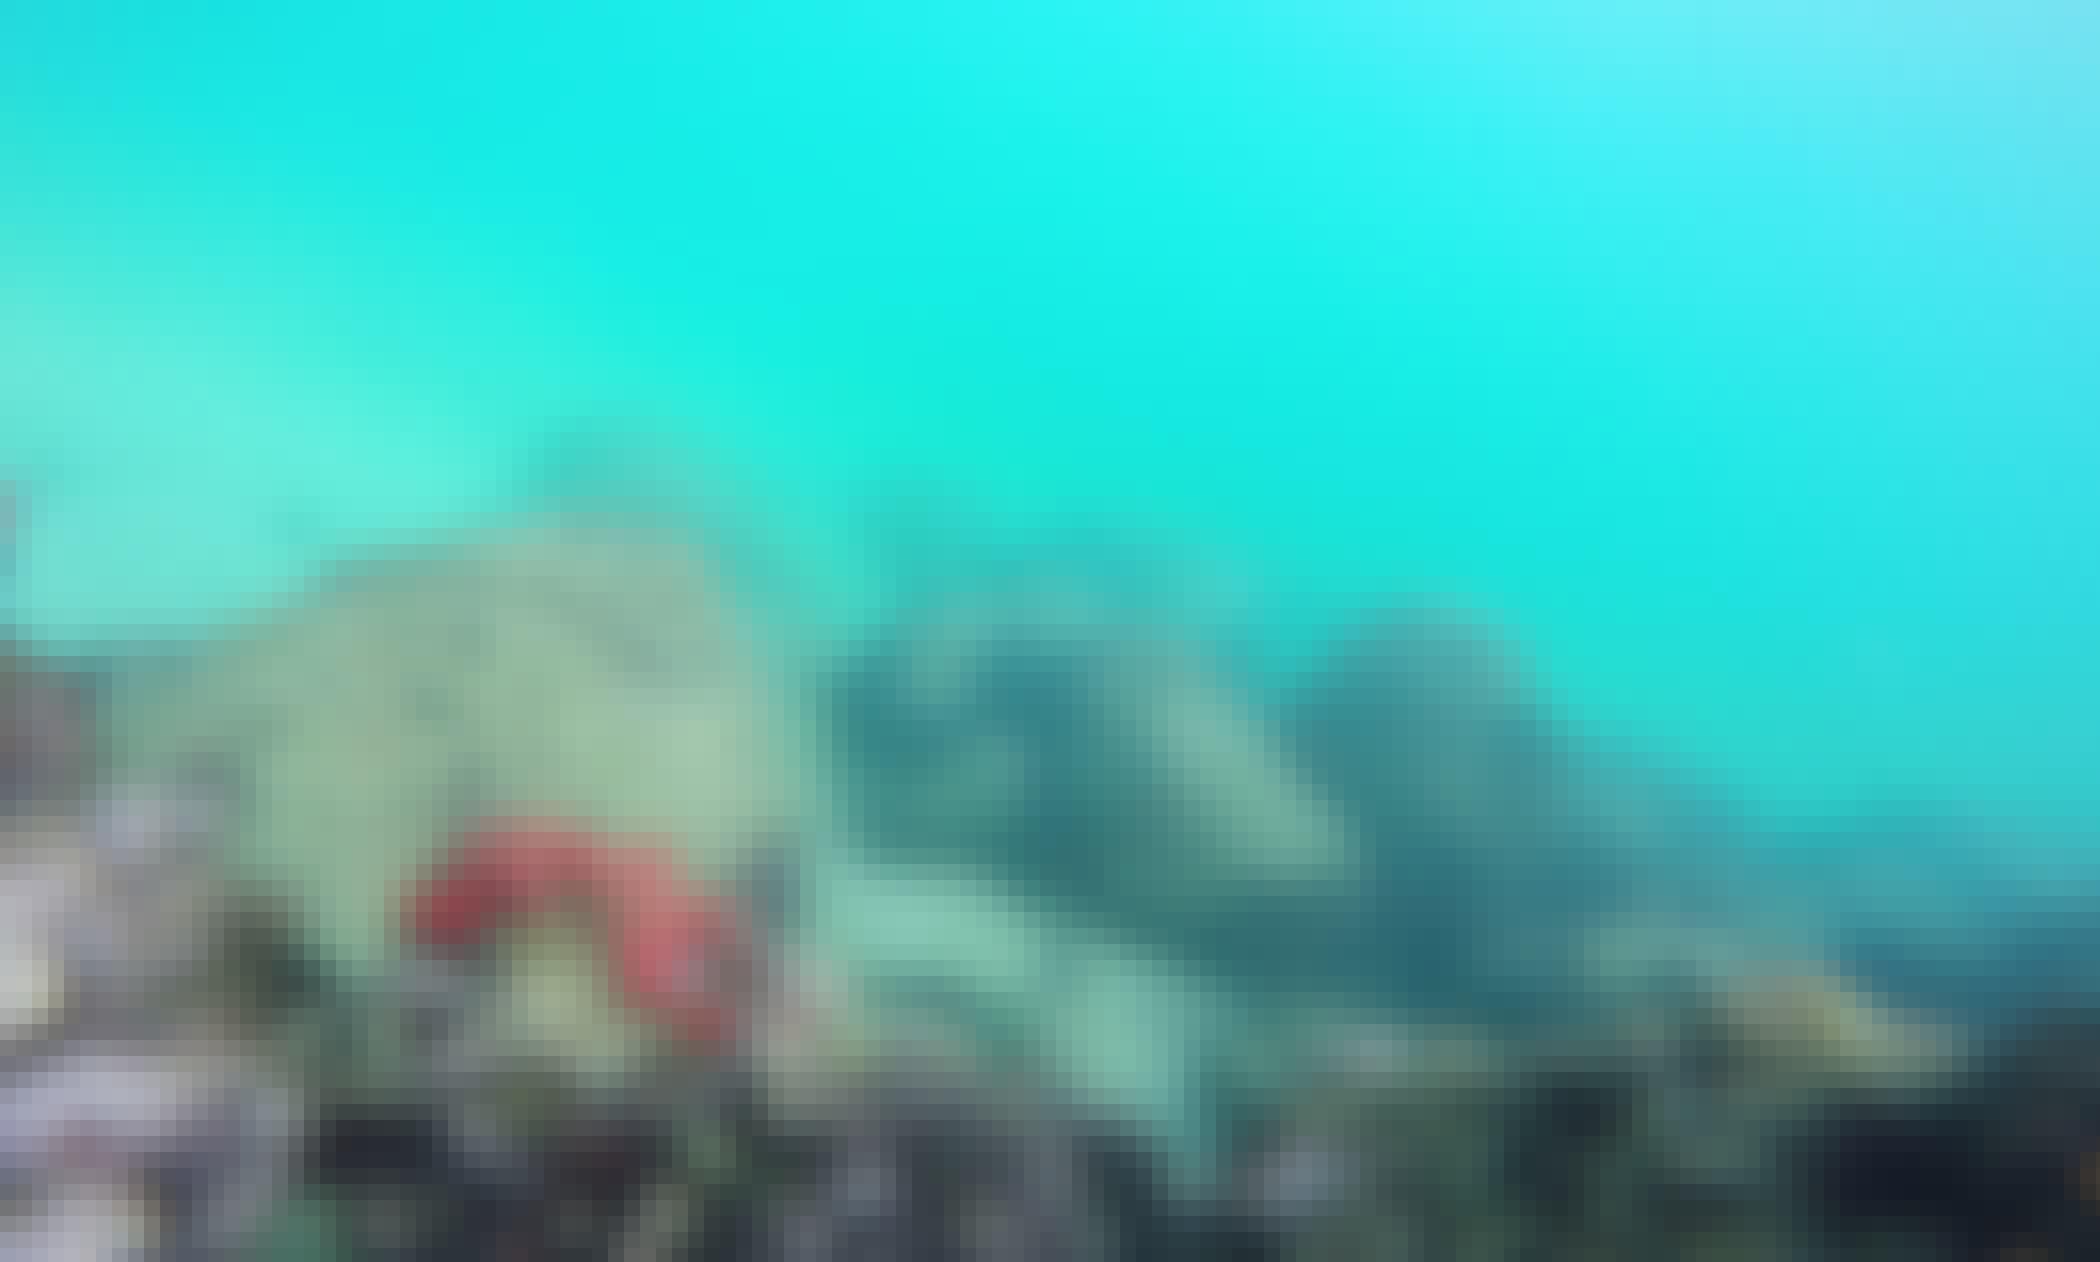 Join Us Explore The Unexplored In The Sea!